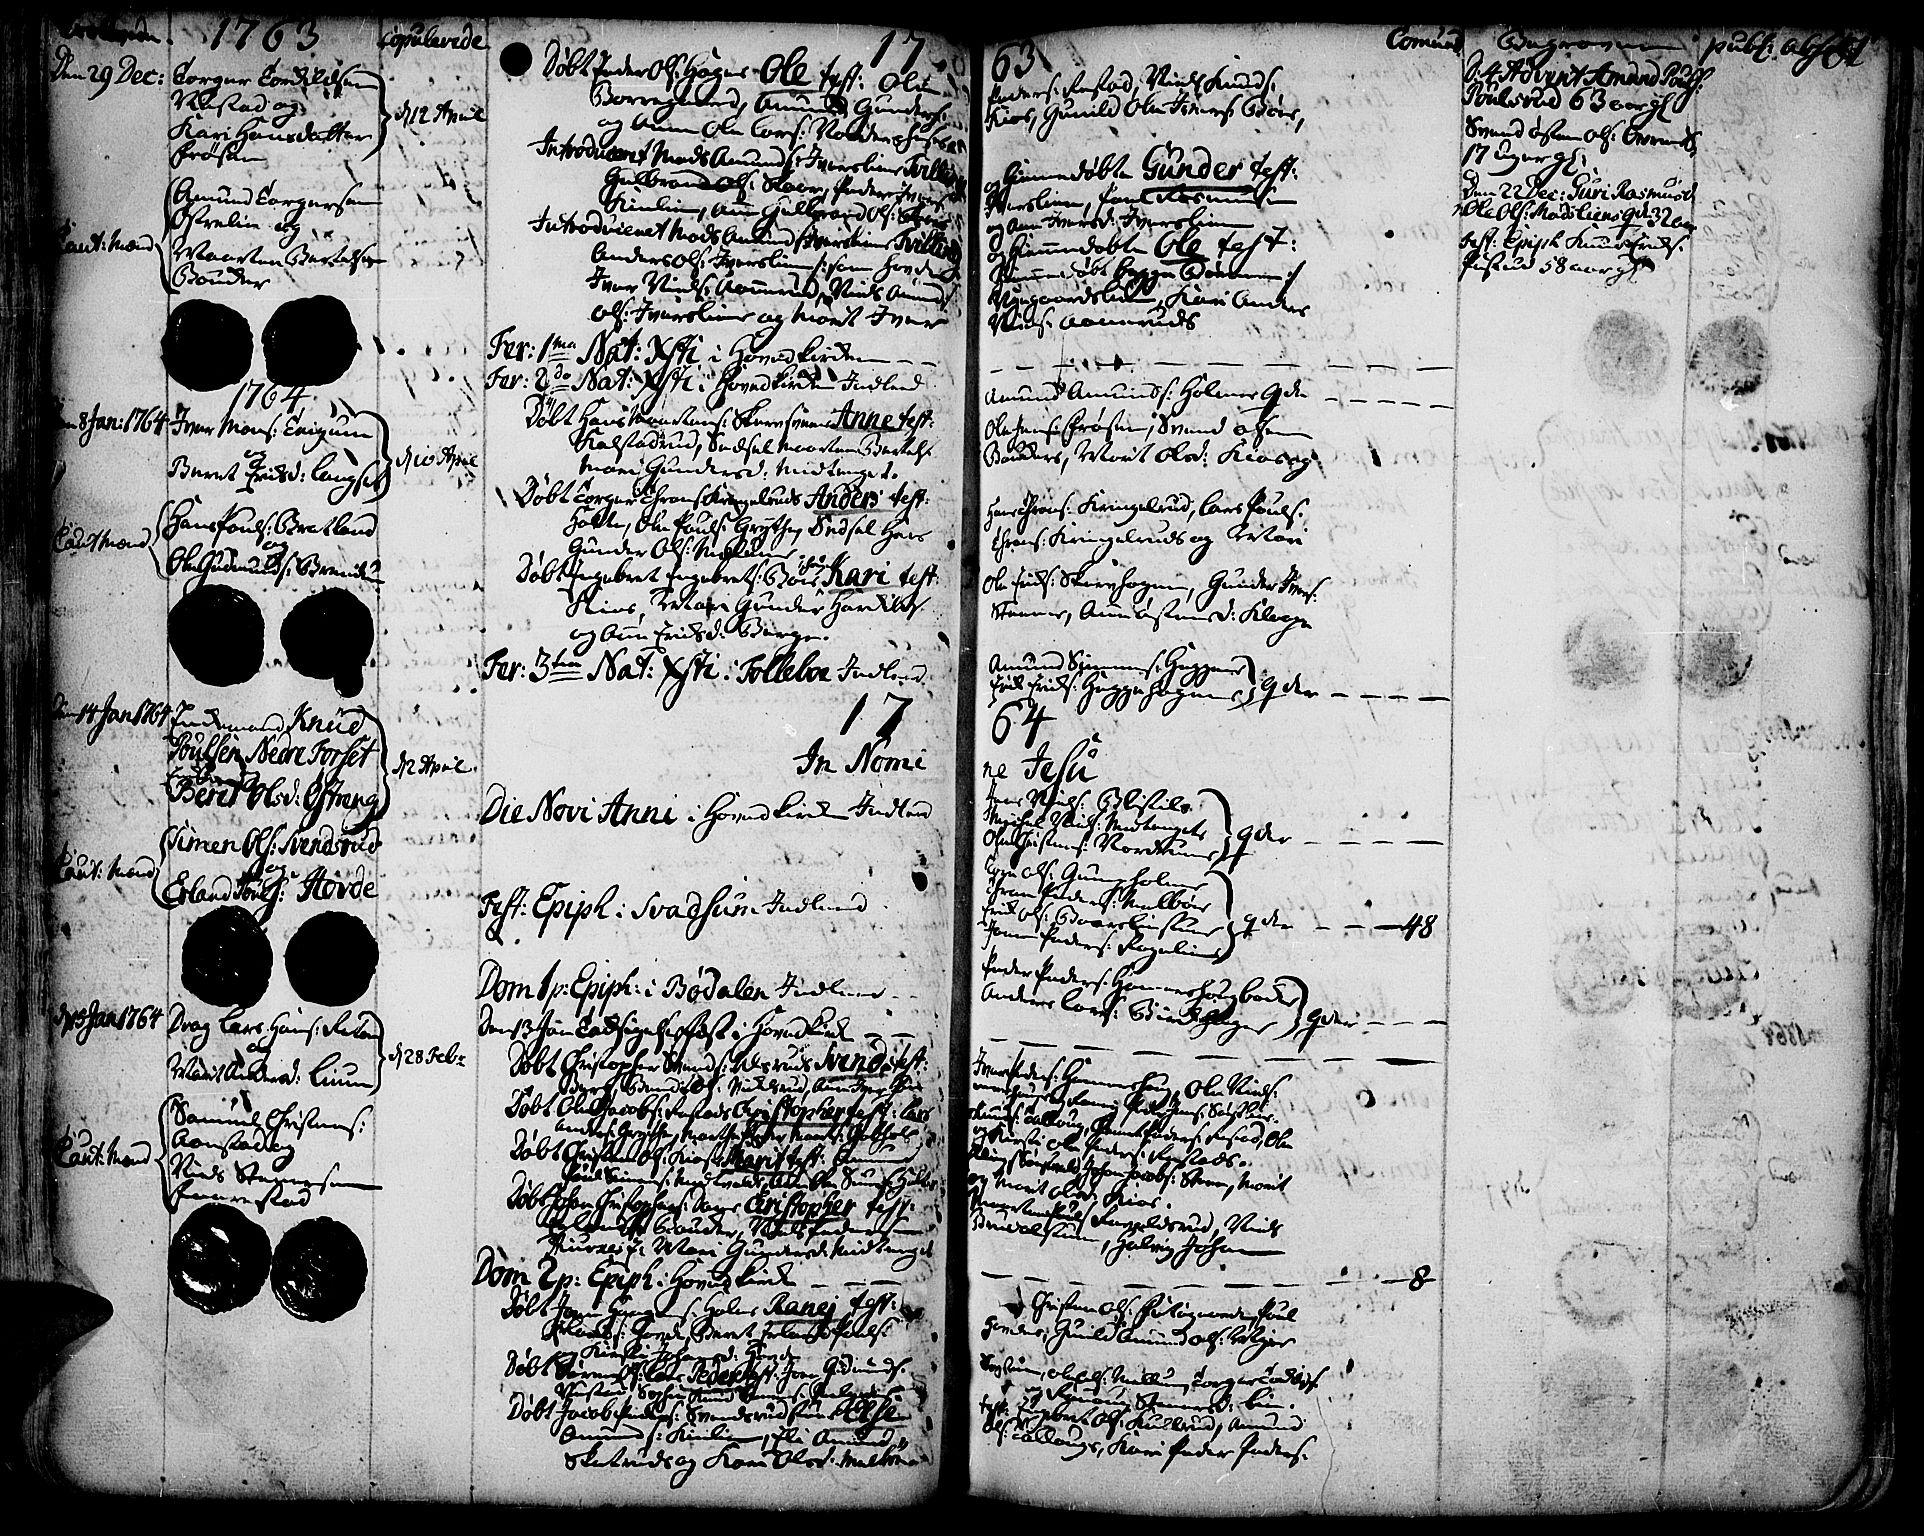 SAH, Gausdal prestekontor, Ministerialbok nr. 3, 1758-1809, s. 51